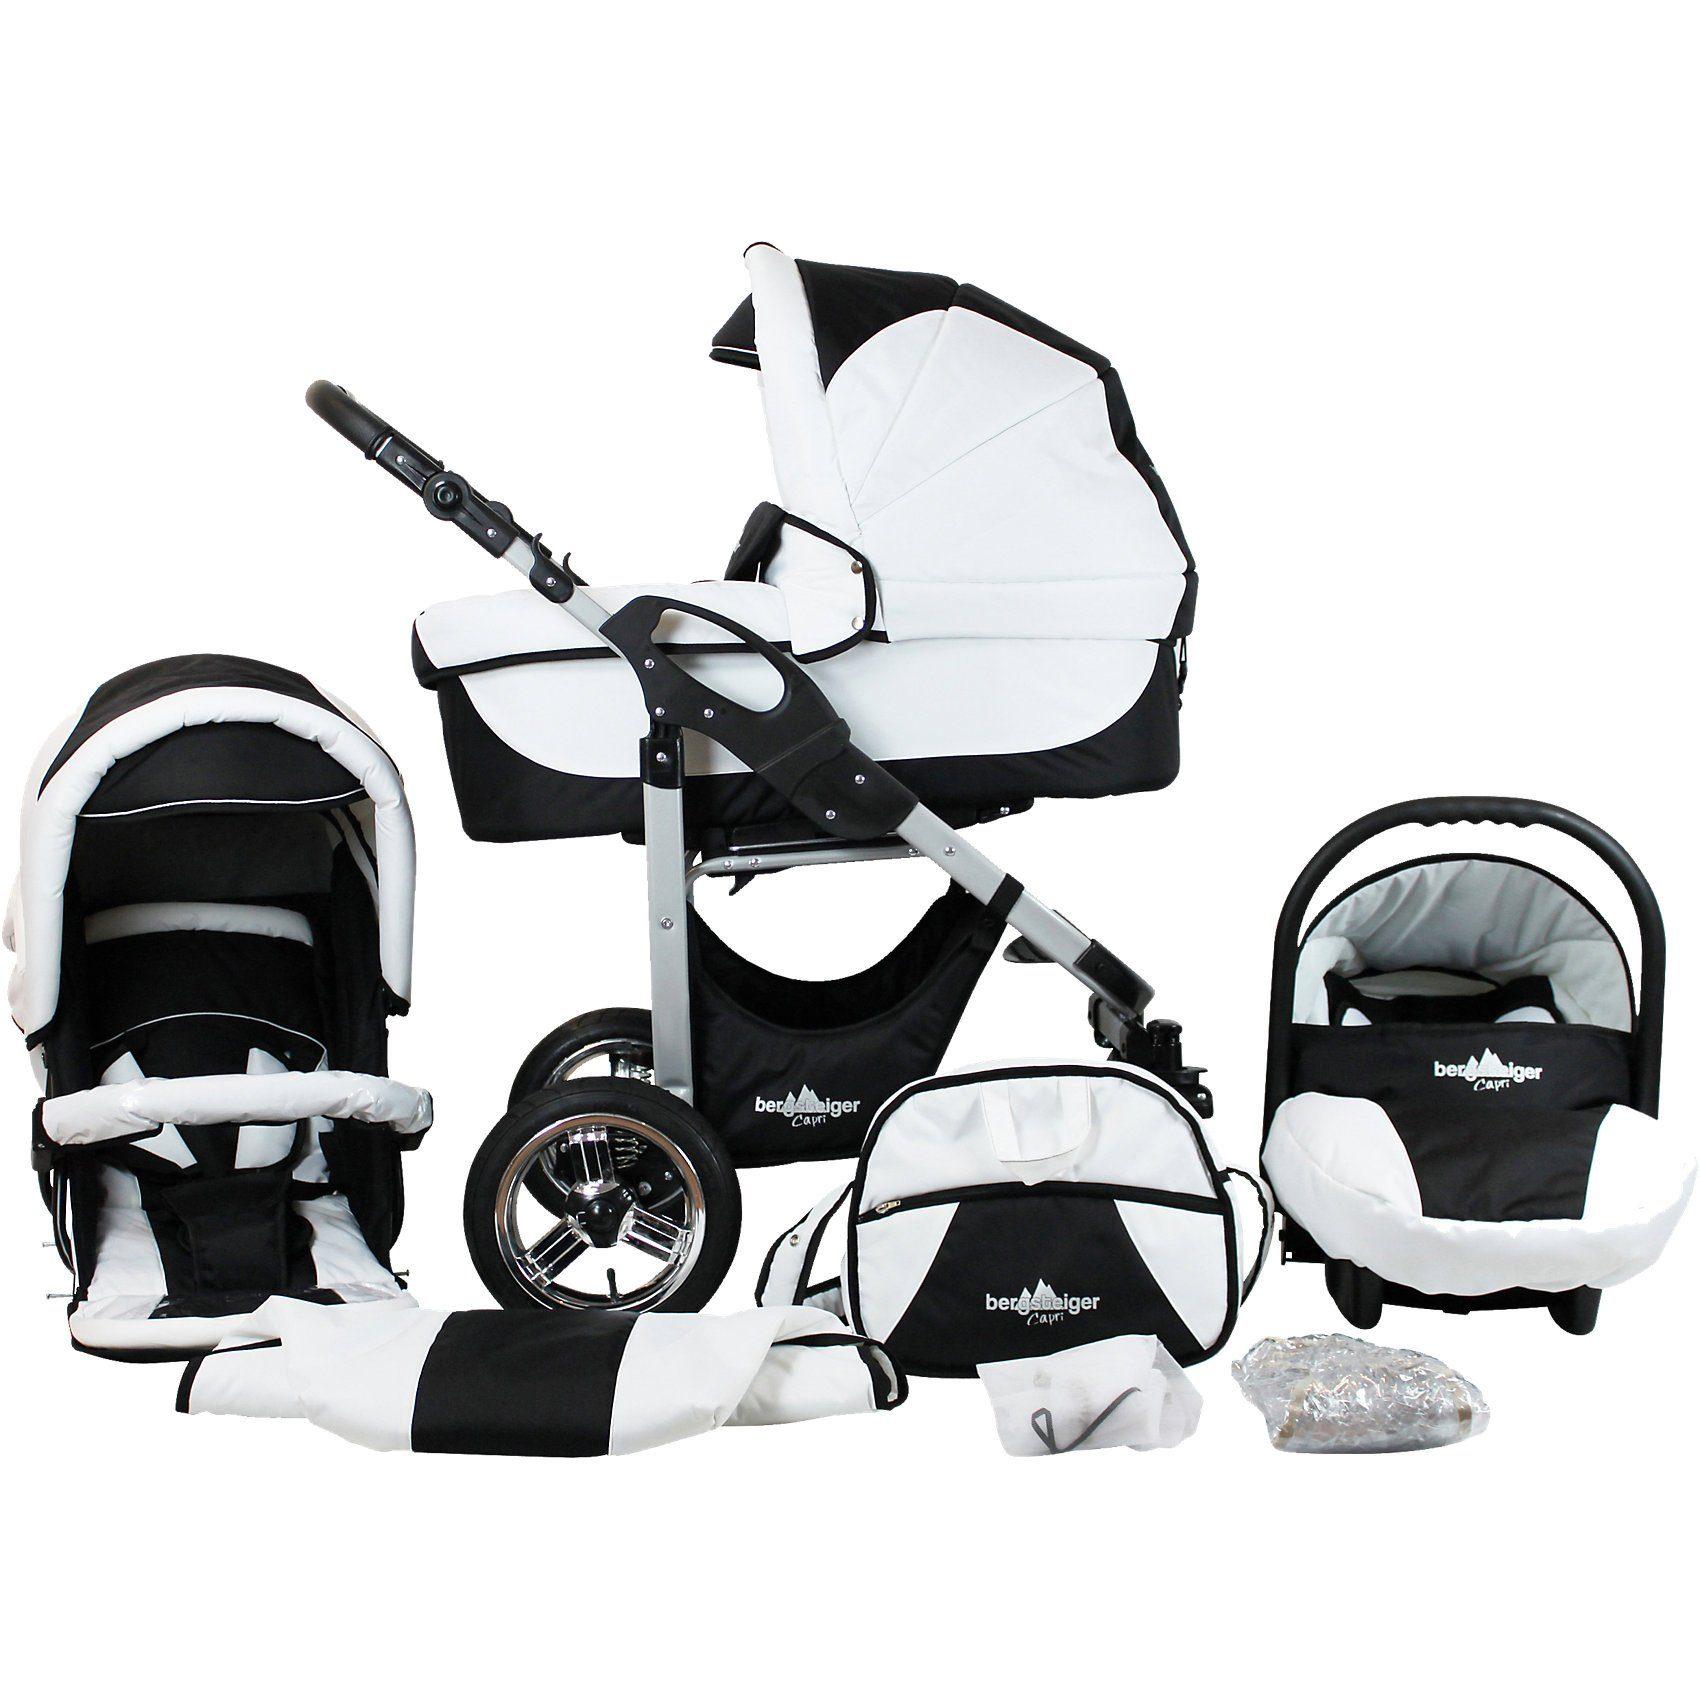 Bergsteiger Kombi Kinderwagen Capri, 10 tlg., black & white